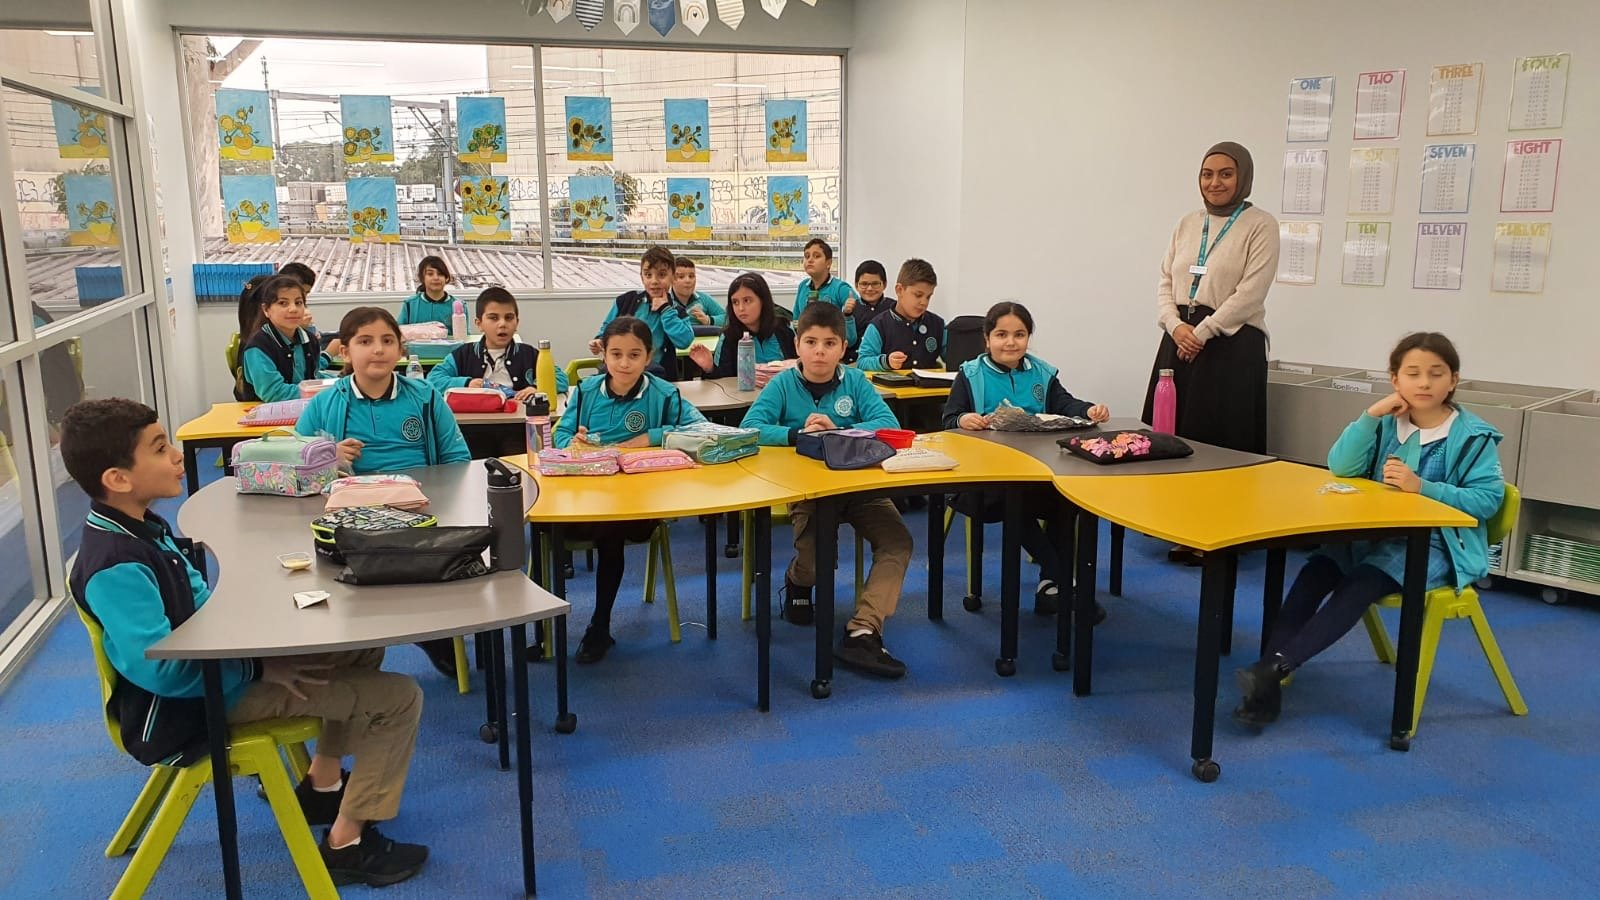 Maarif Foundation: Turkey's international education juggernaut thumbnail